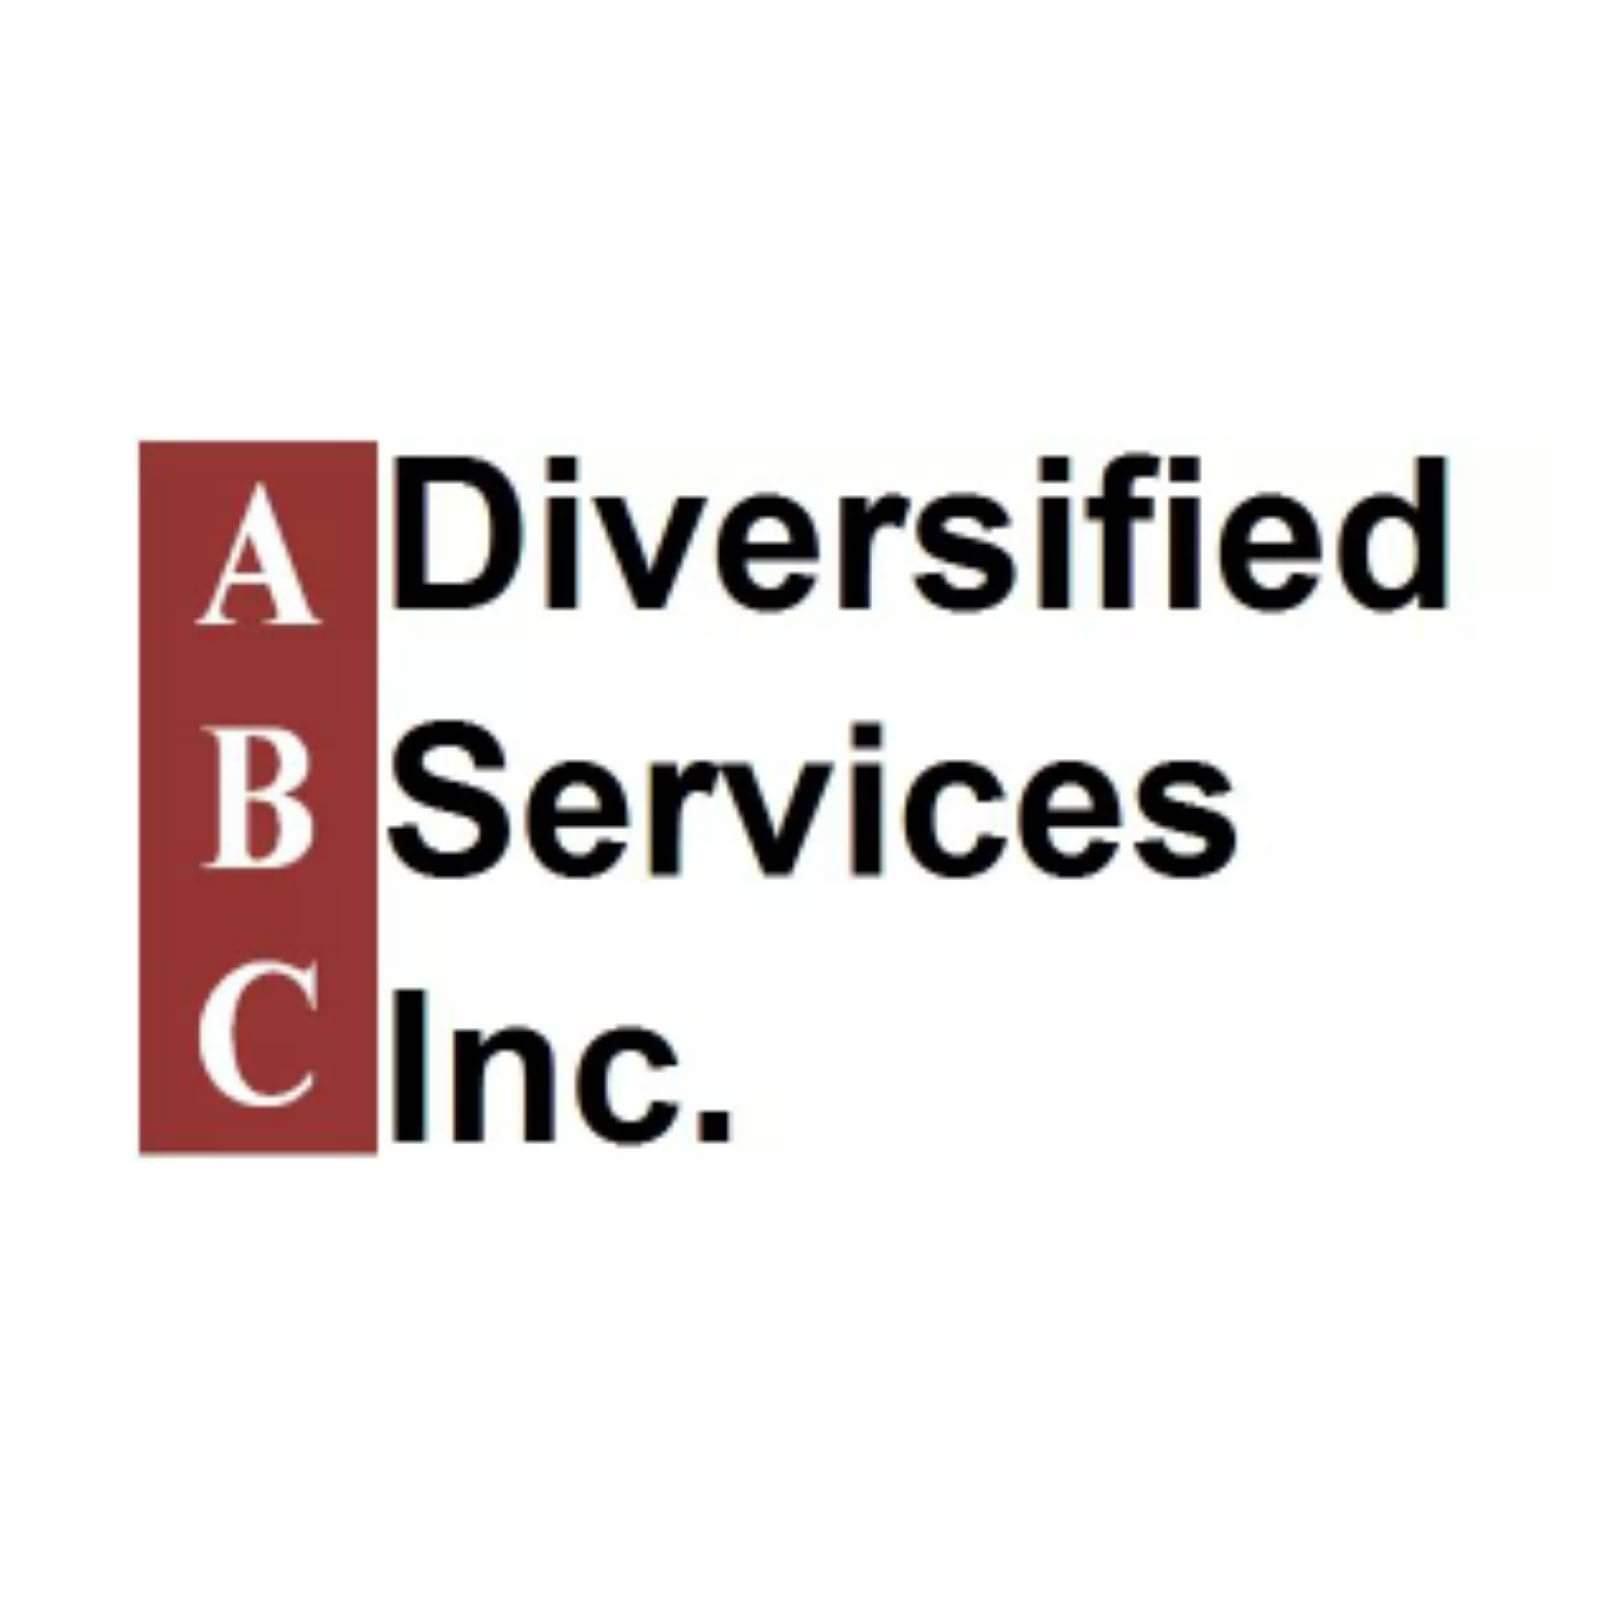 ABC Diversified Services, Inc.